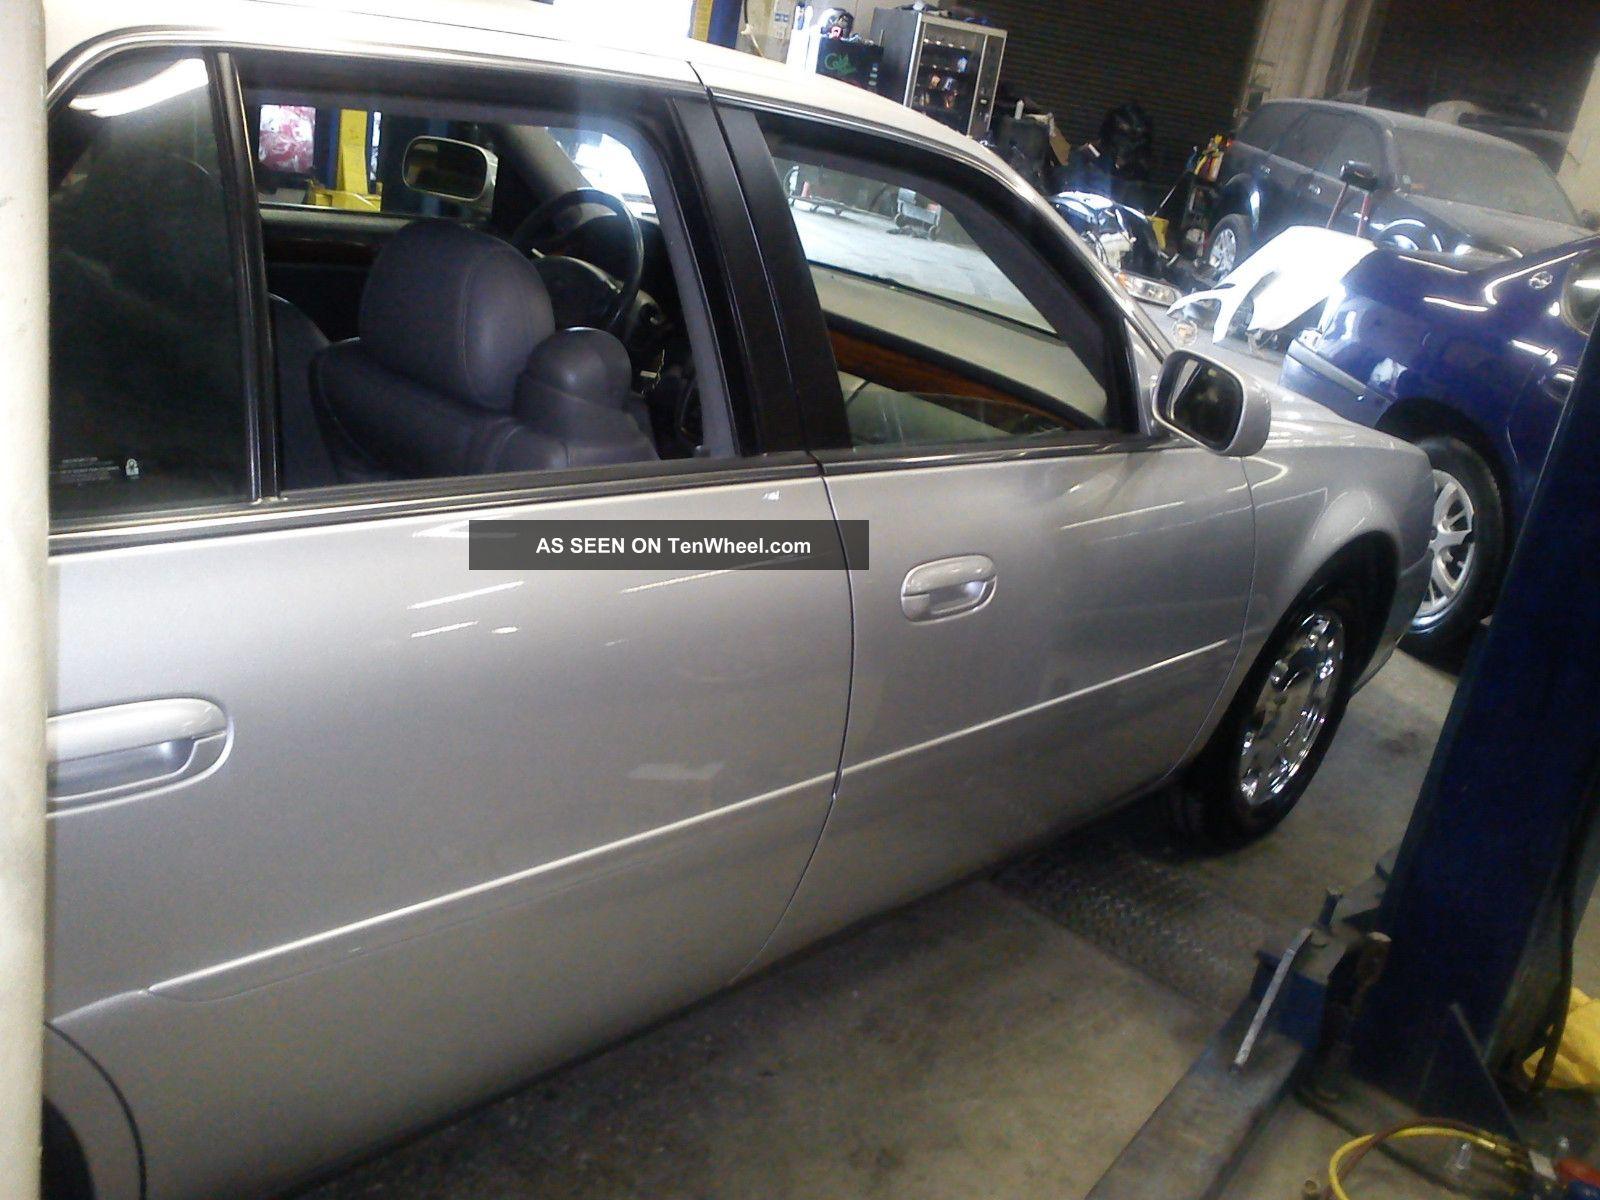 2002 Cadillac Deville Dts Sedan 4 Door 4 6l